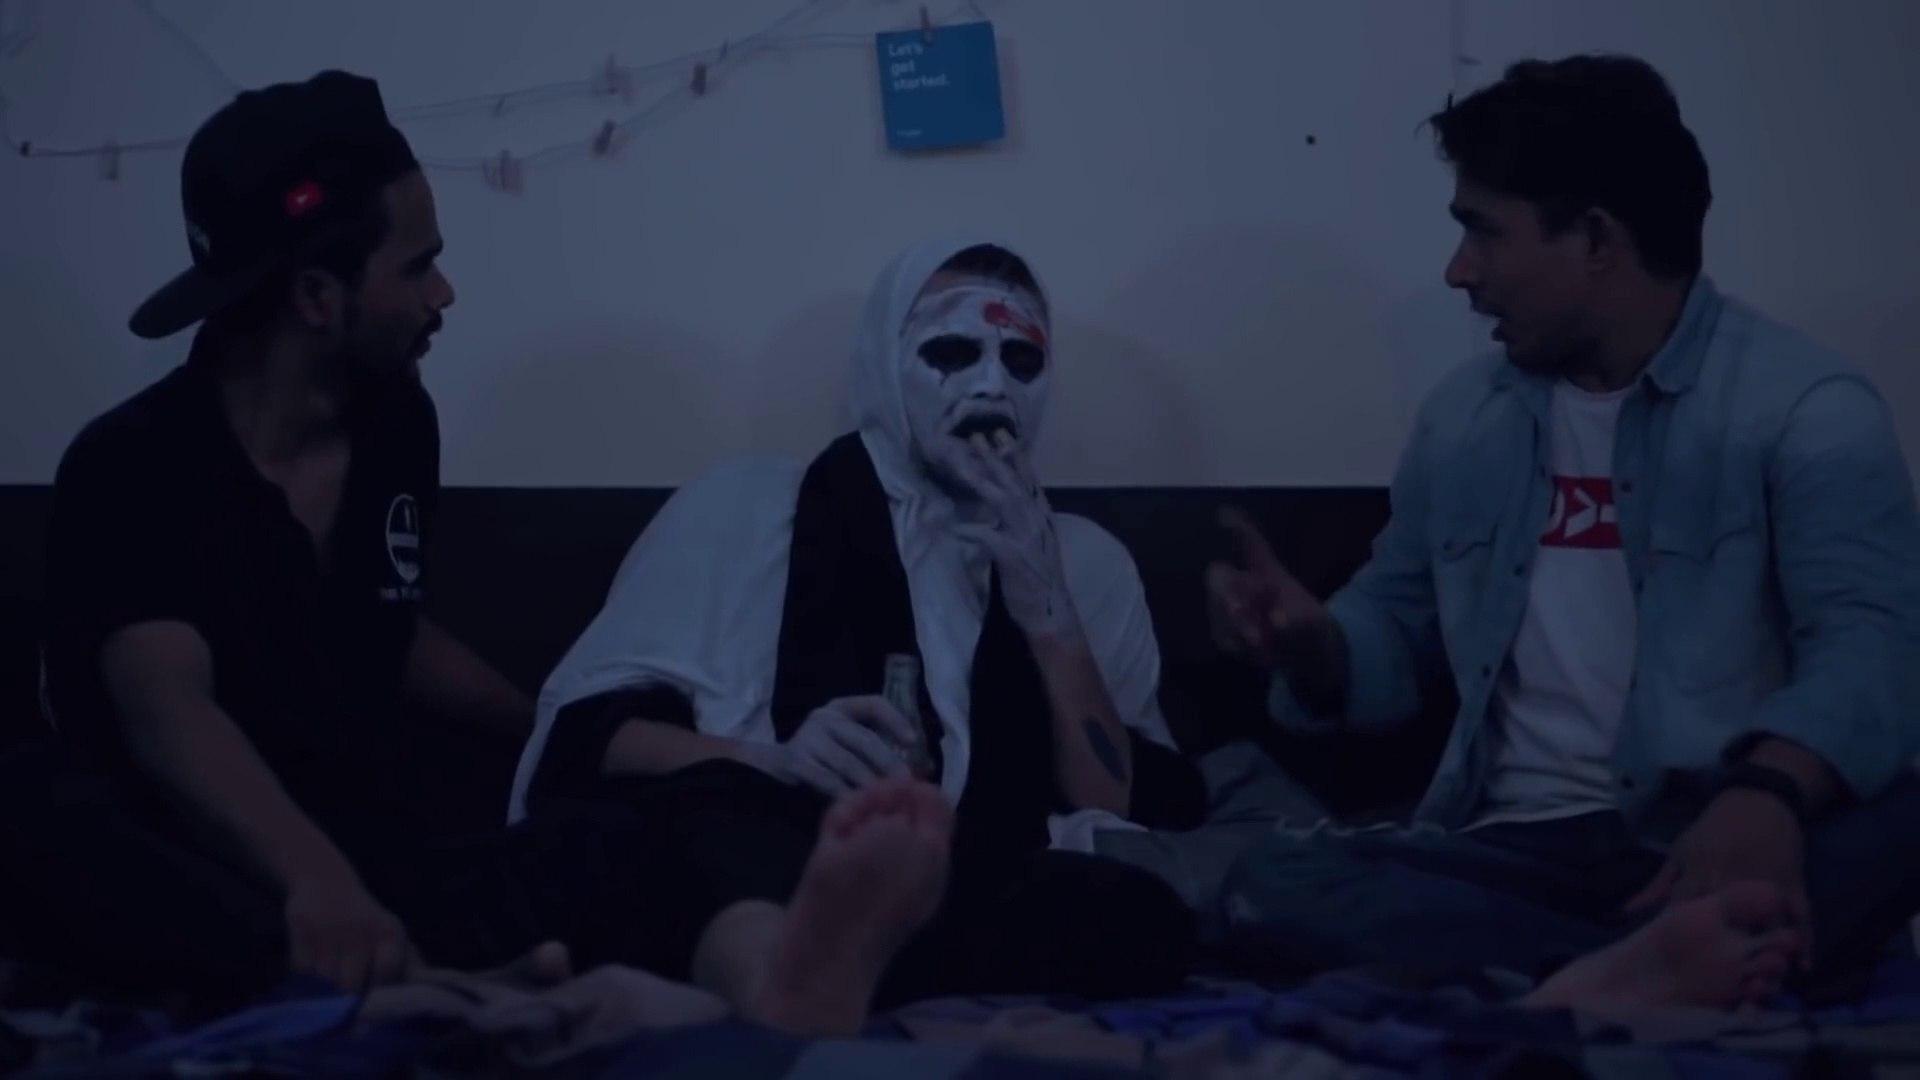 Round 2 hell new video Bhutiya Ghar Nazim videos funny videos comedy videos